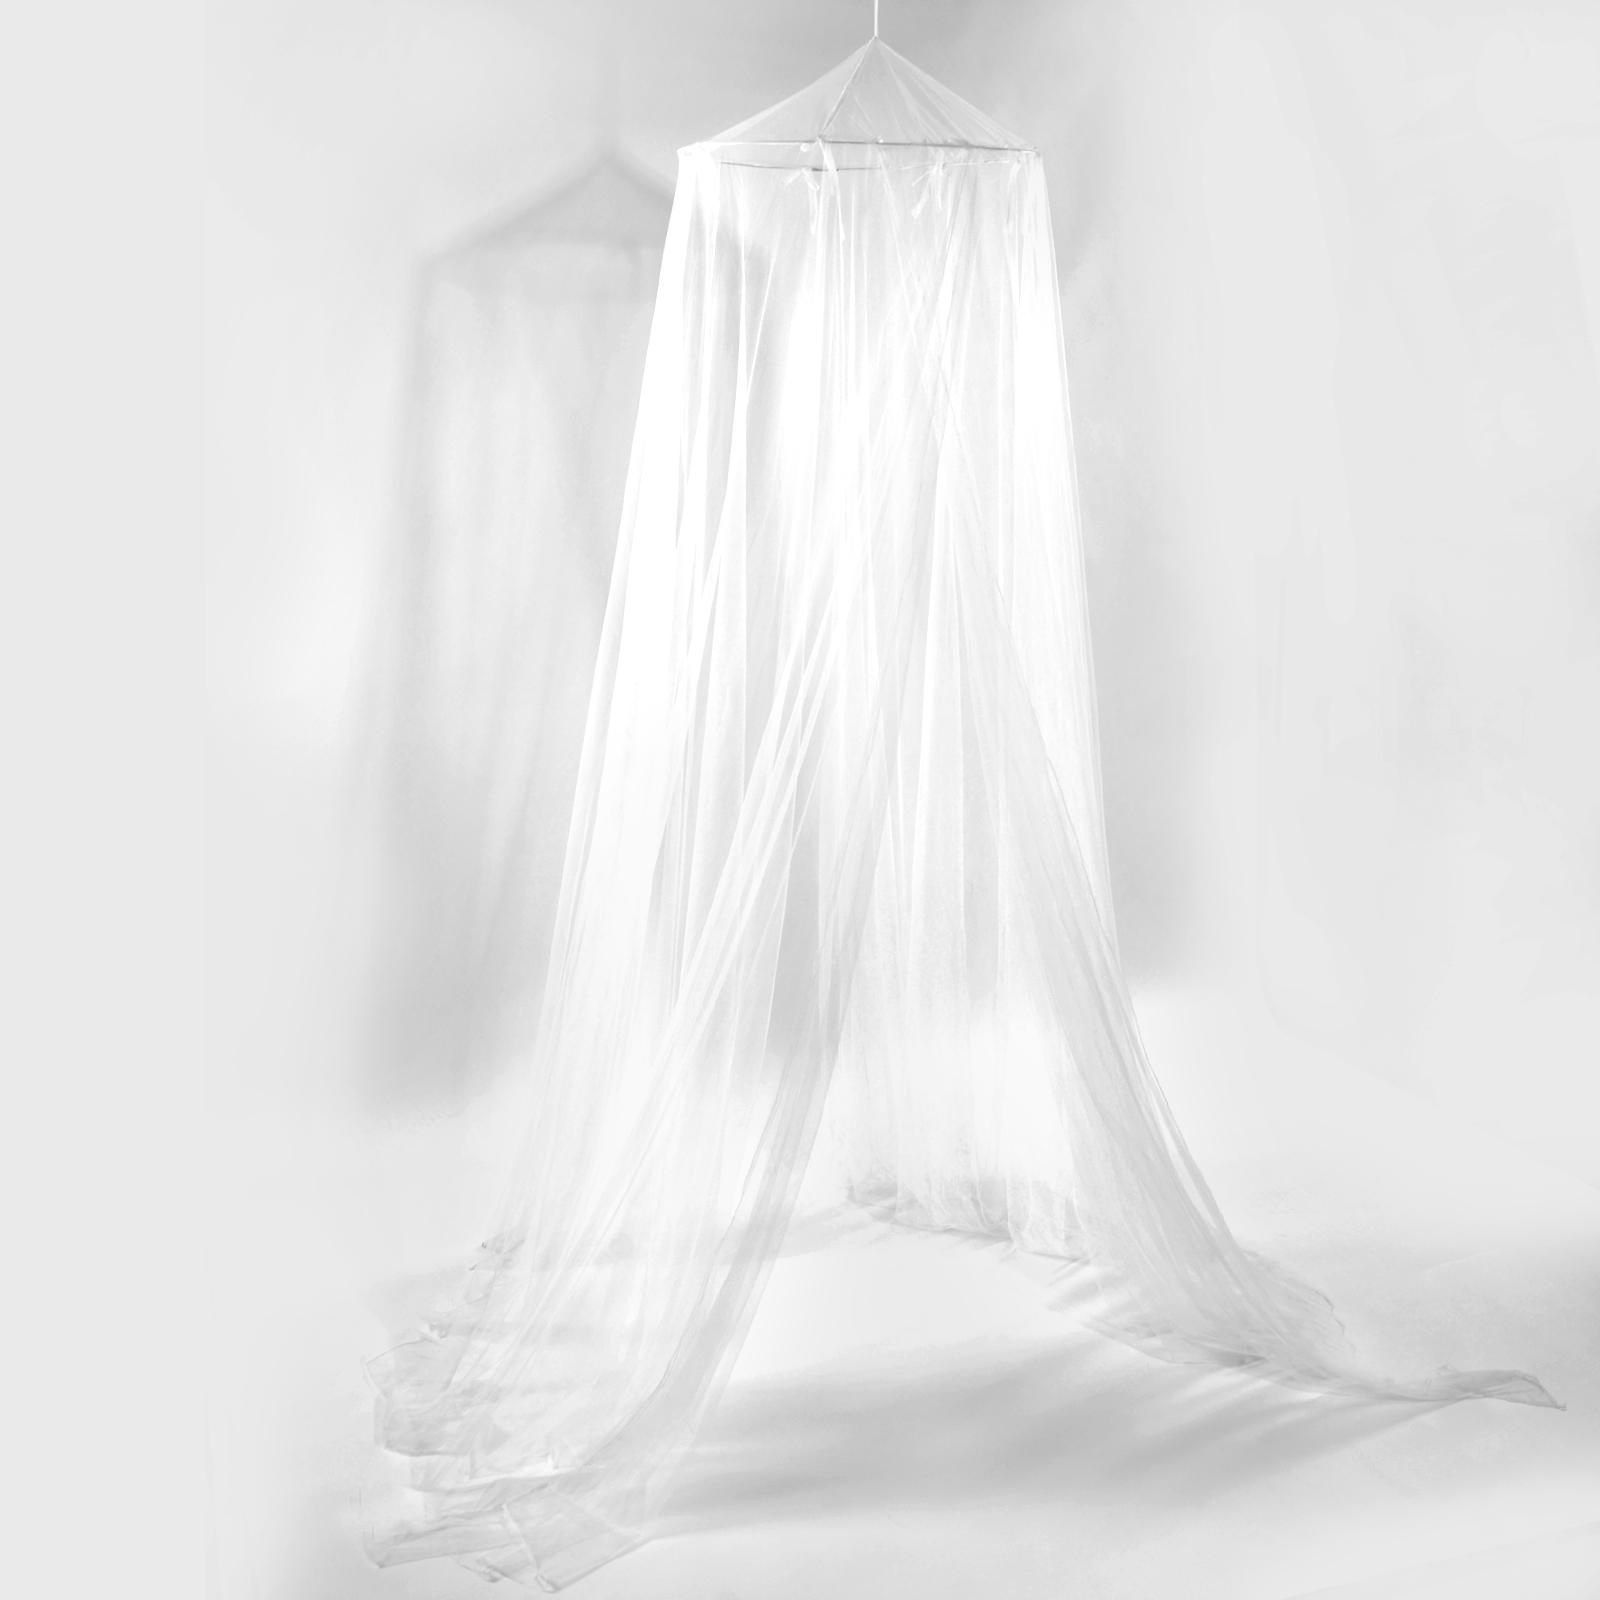 camping moustiquaire mosquito net ciel lit rond 1 2 personne voyage randonne ebay. Black Bedroom Furniture Sets. Home Design Ideas